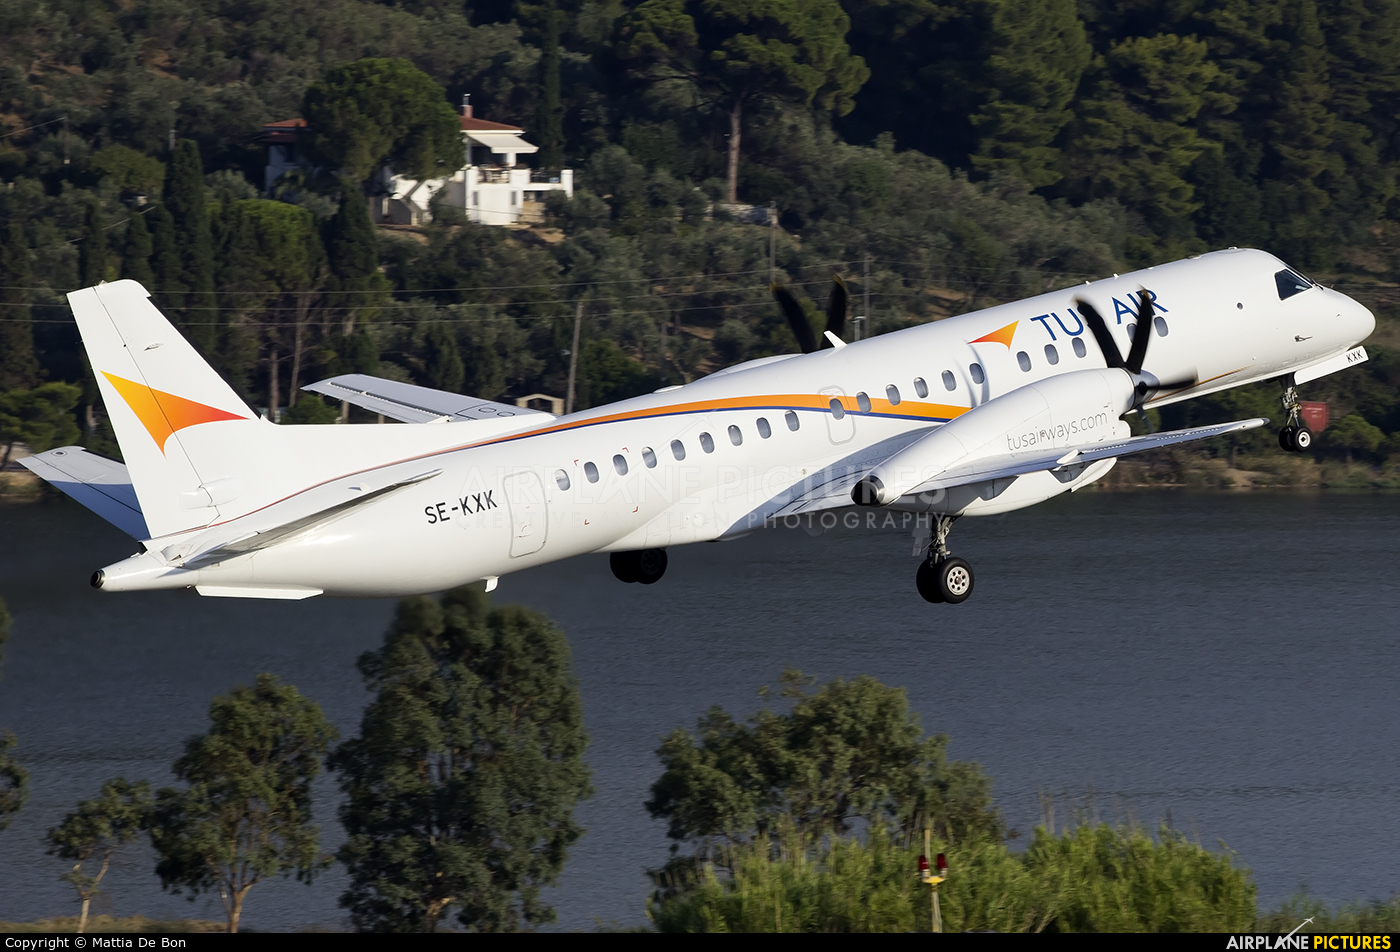 Tus Airways SE-KXK aircraft at Skiathos